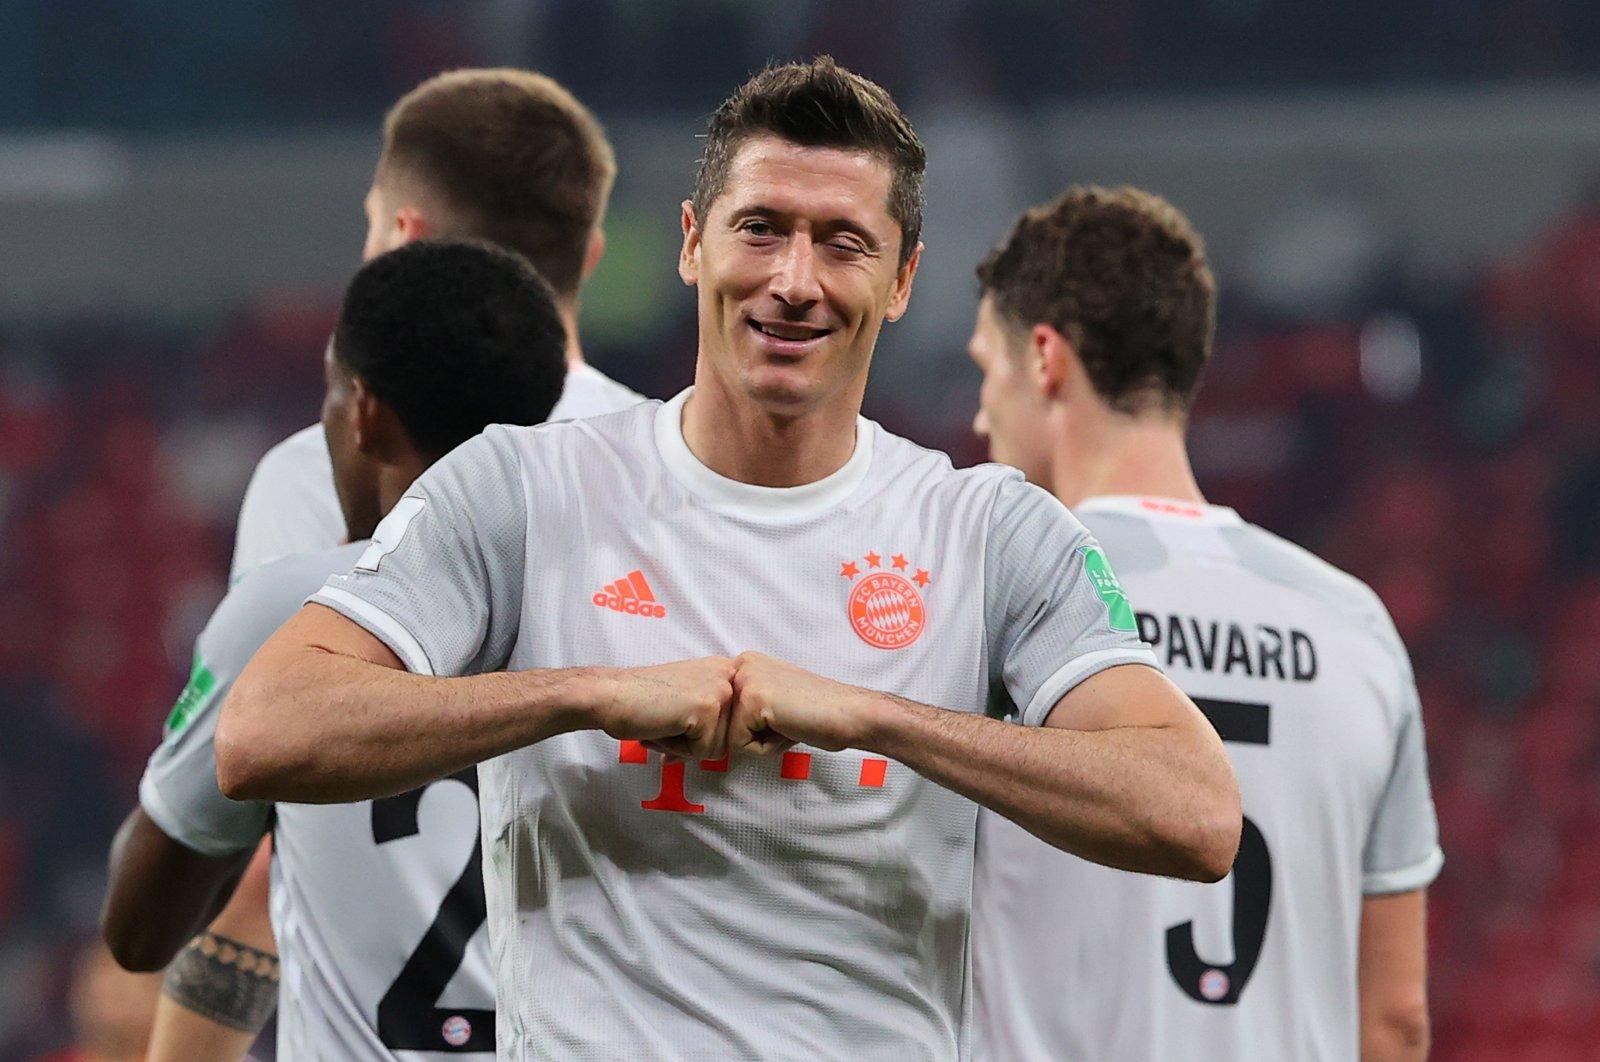 Bayern Munich's Polish forward Robert Lewandowski celebrates his second goal in the FIFA Club World Cup semifinal against Egypt's Al-Ahly at the Ahmed bin Ali Stadium, Al-Rayyan, Qatar, Feb. 8, 2021. (AFP Photo)